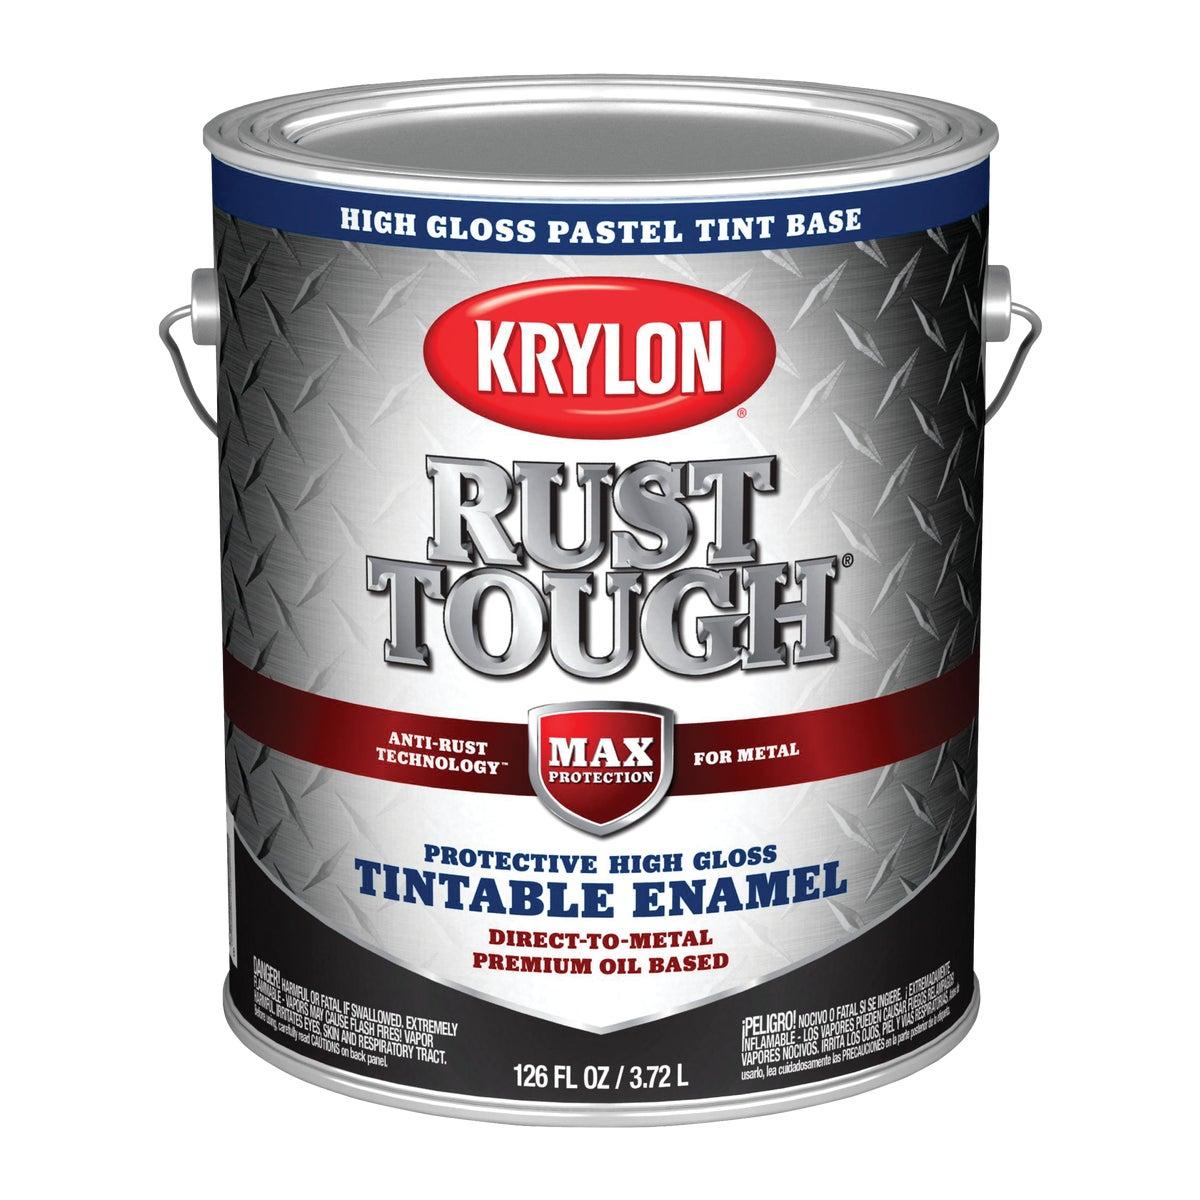 GLS PASTL BS RUST ENAMEL - 044.0021805.007 by Valspar Corp